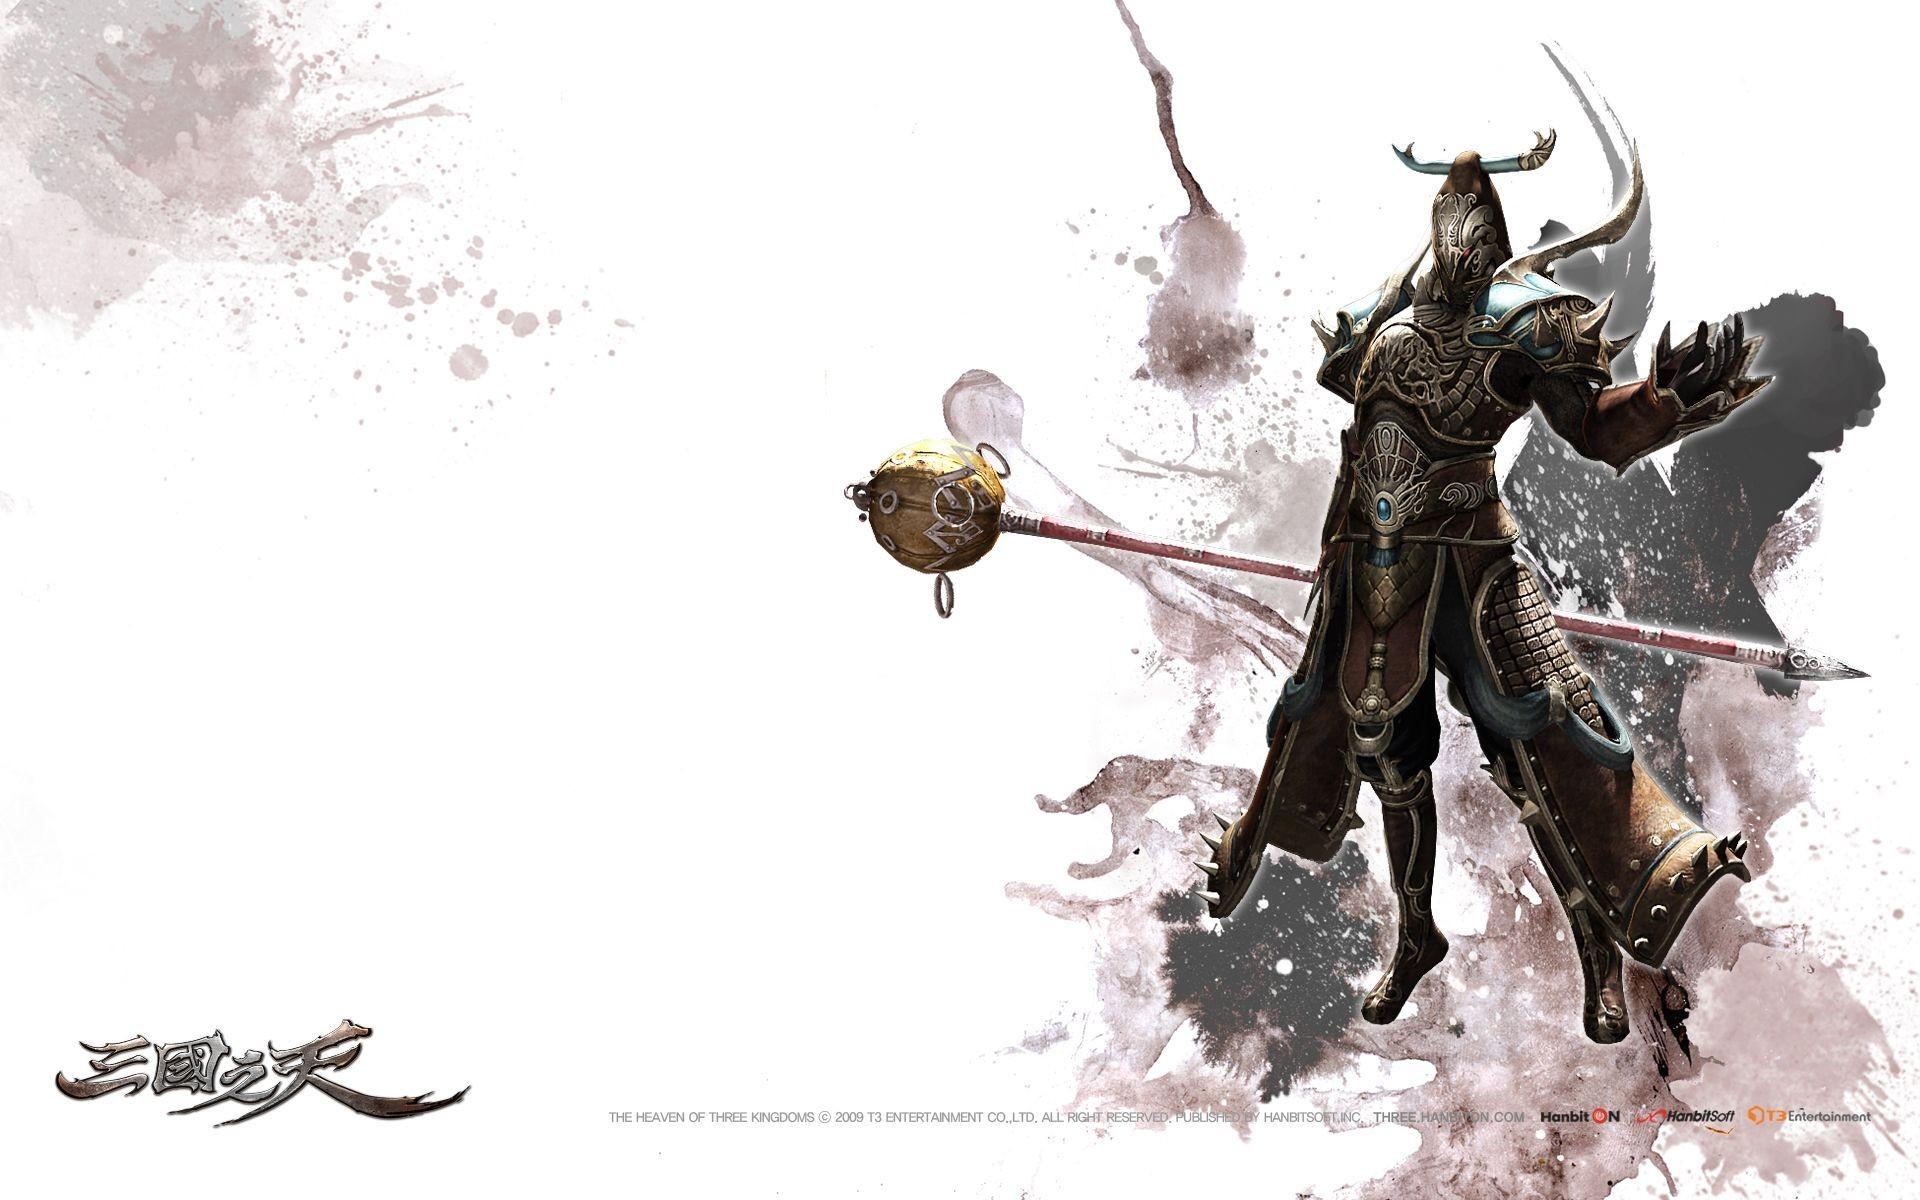 The Heaven Of Three Kingdom (Games)